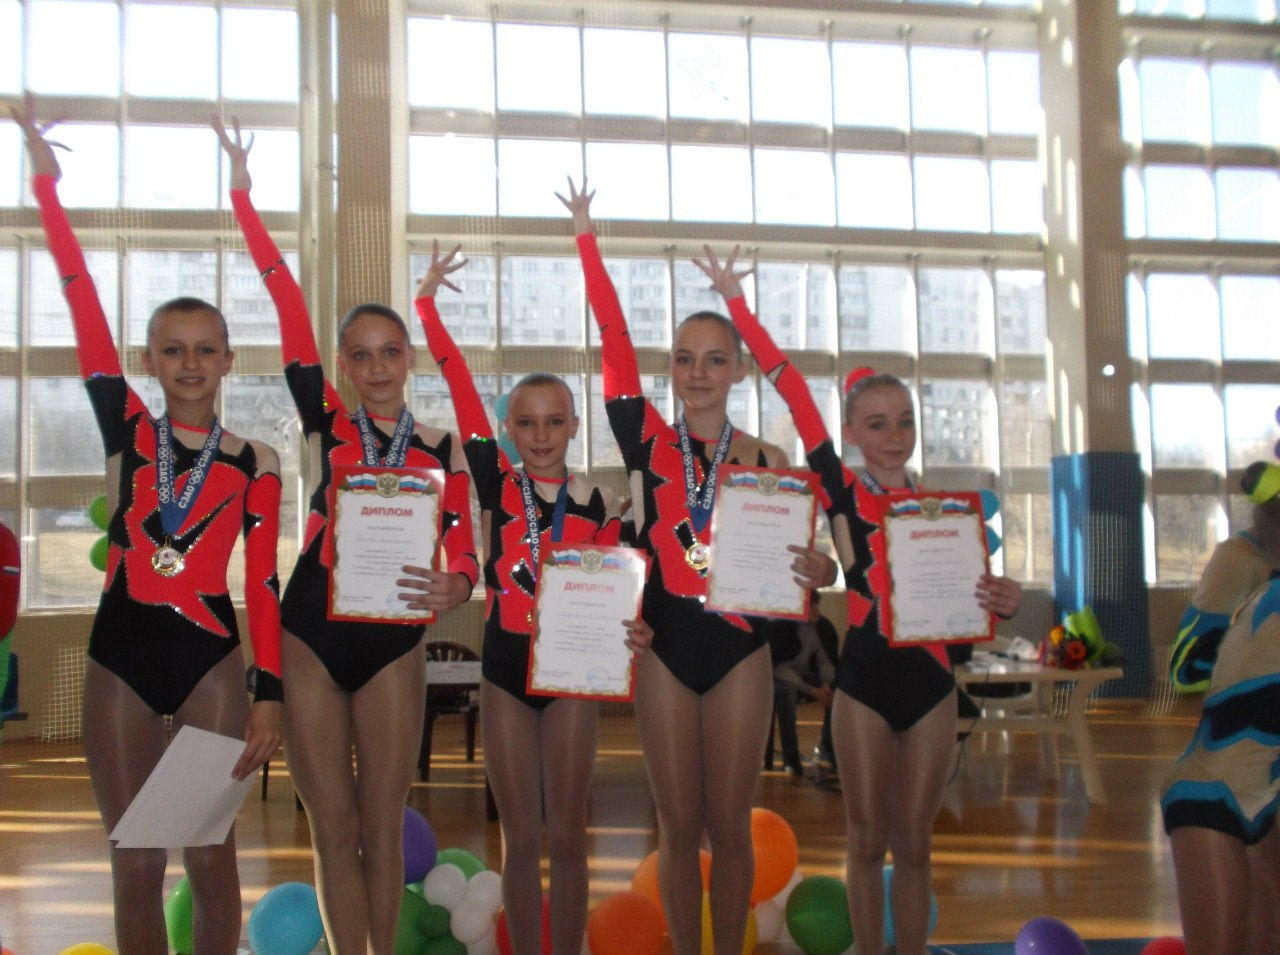 aerobics-szfo-2014-04